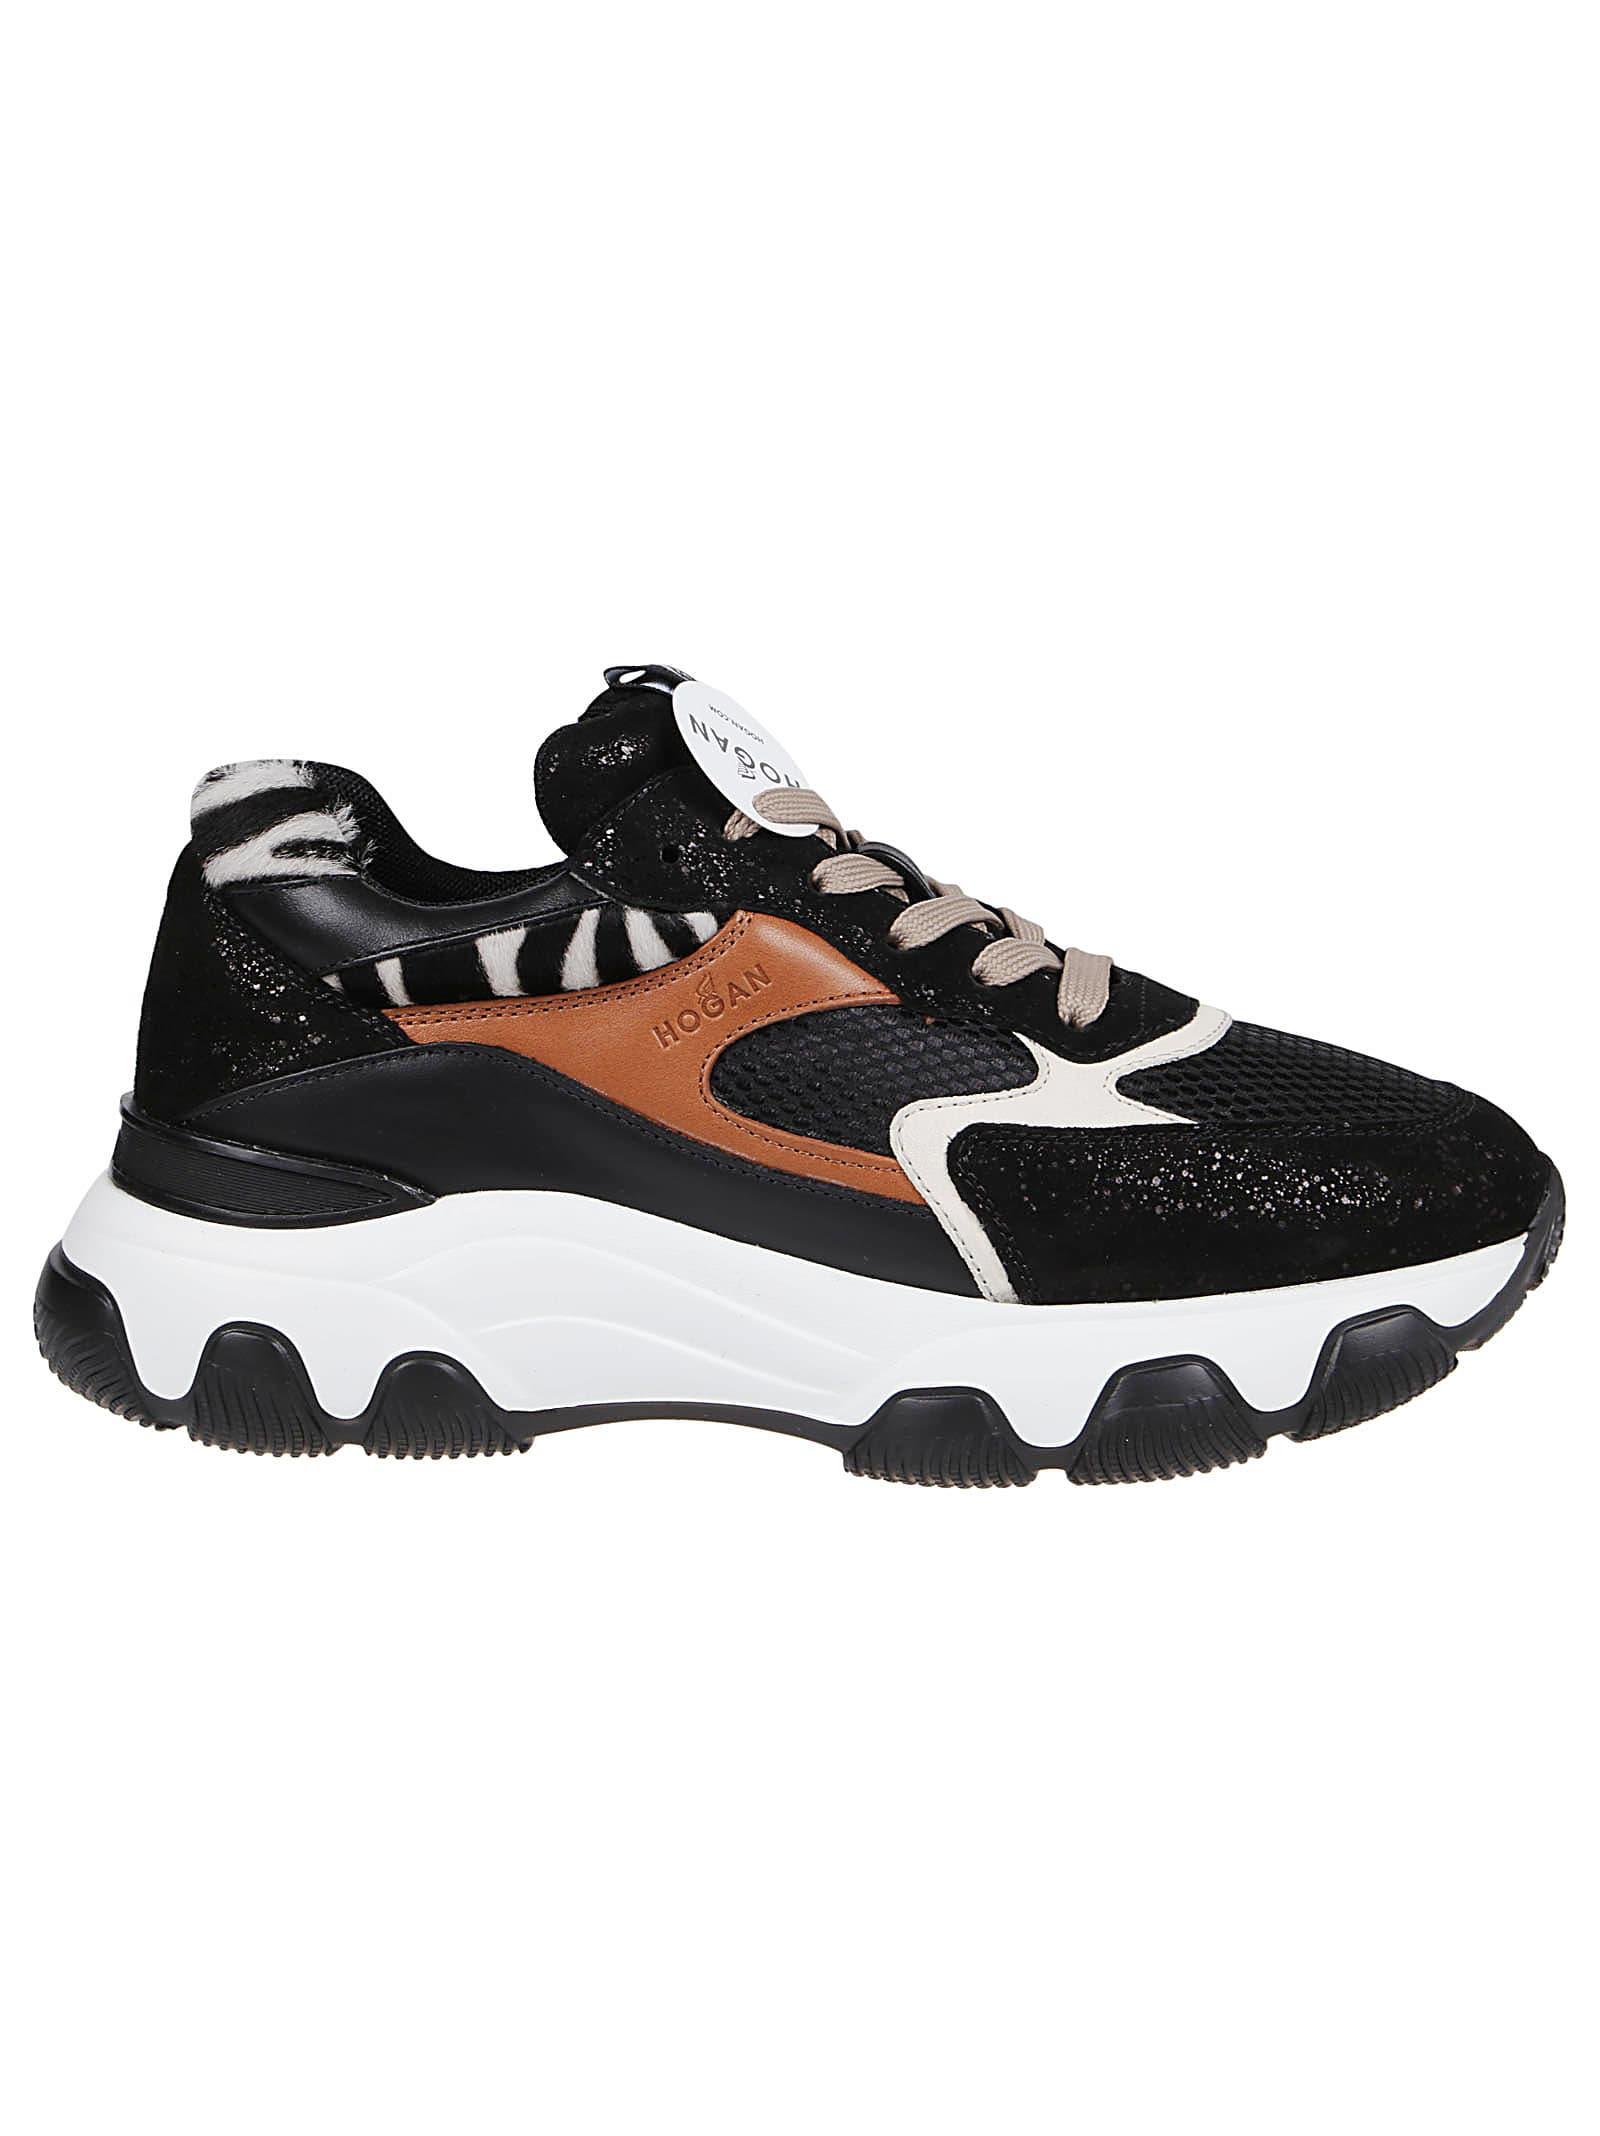 Hogan Hyperactive Sneakers In Cuoio/nero/bianco   ModeSens